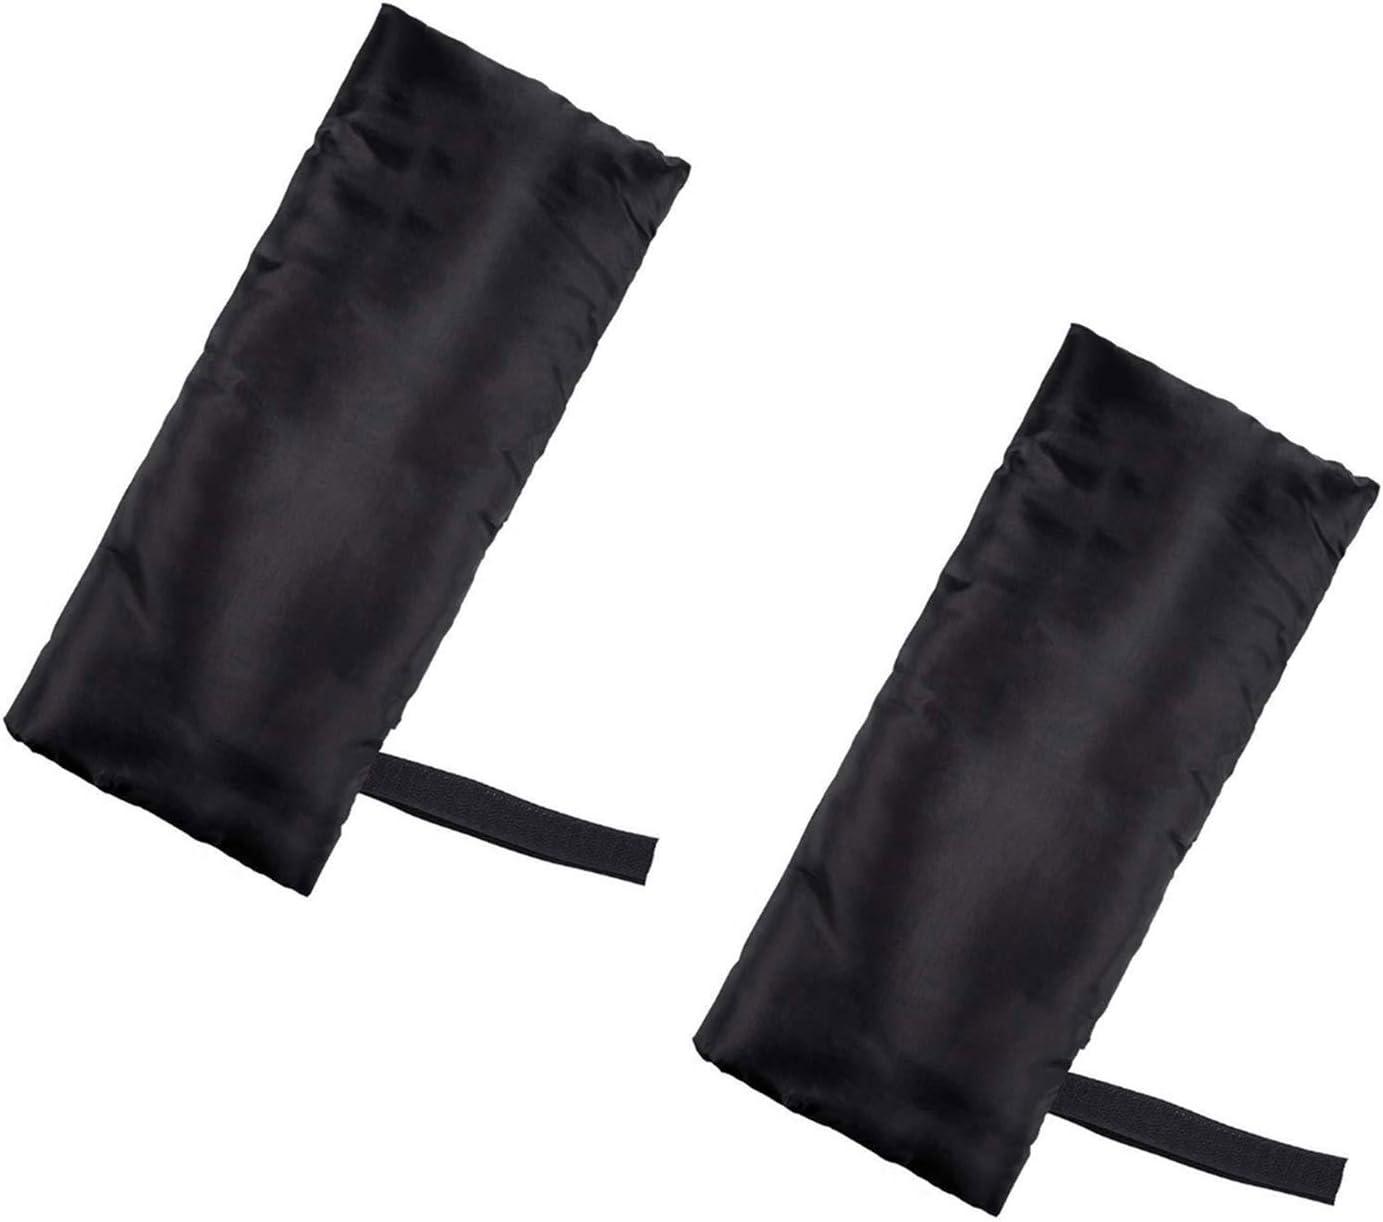 UNIE Outdoor Popular popular Faucet Covers for Winter Socks Garden ...